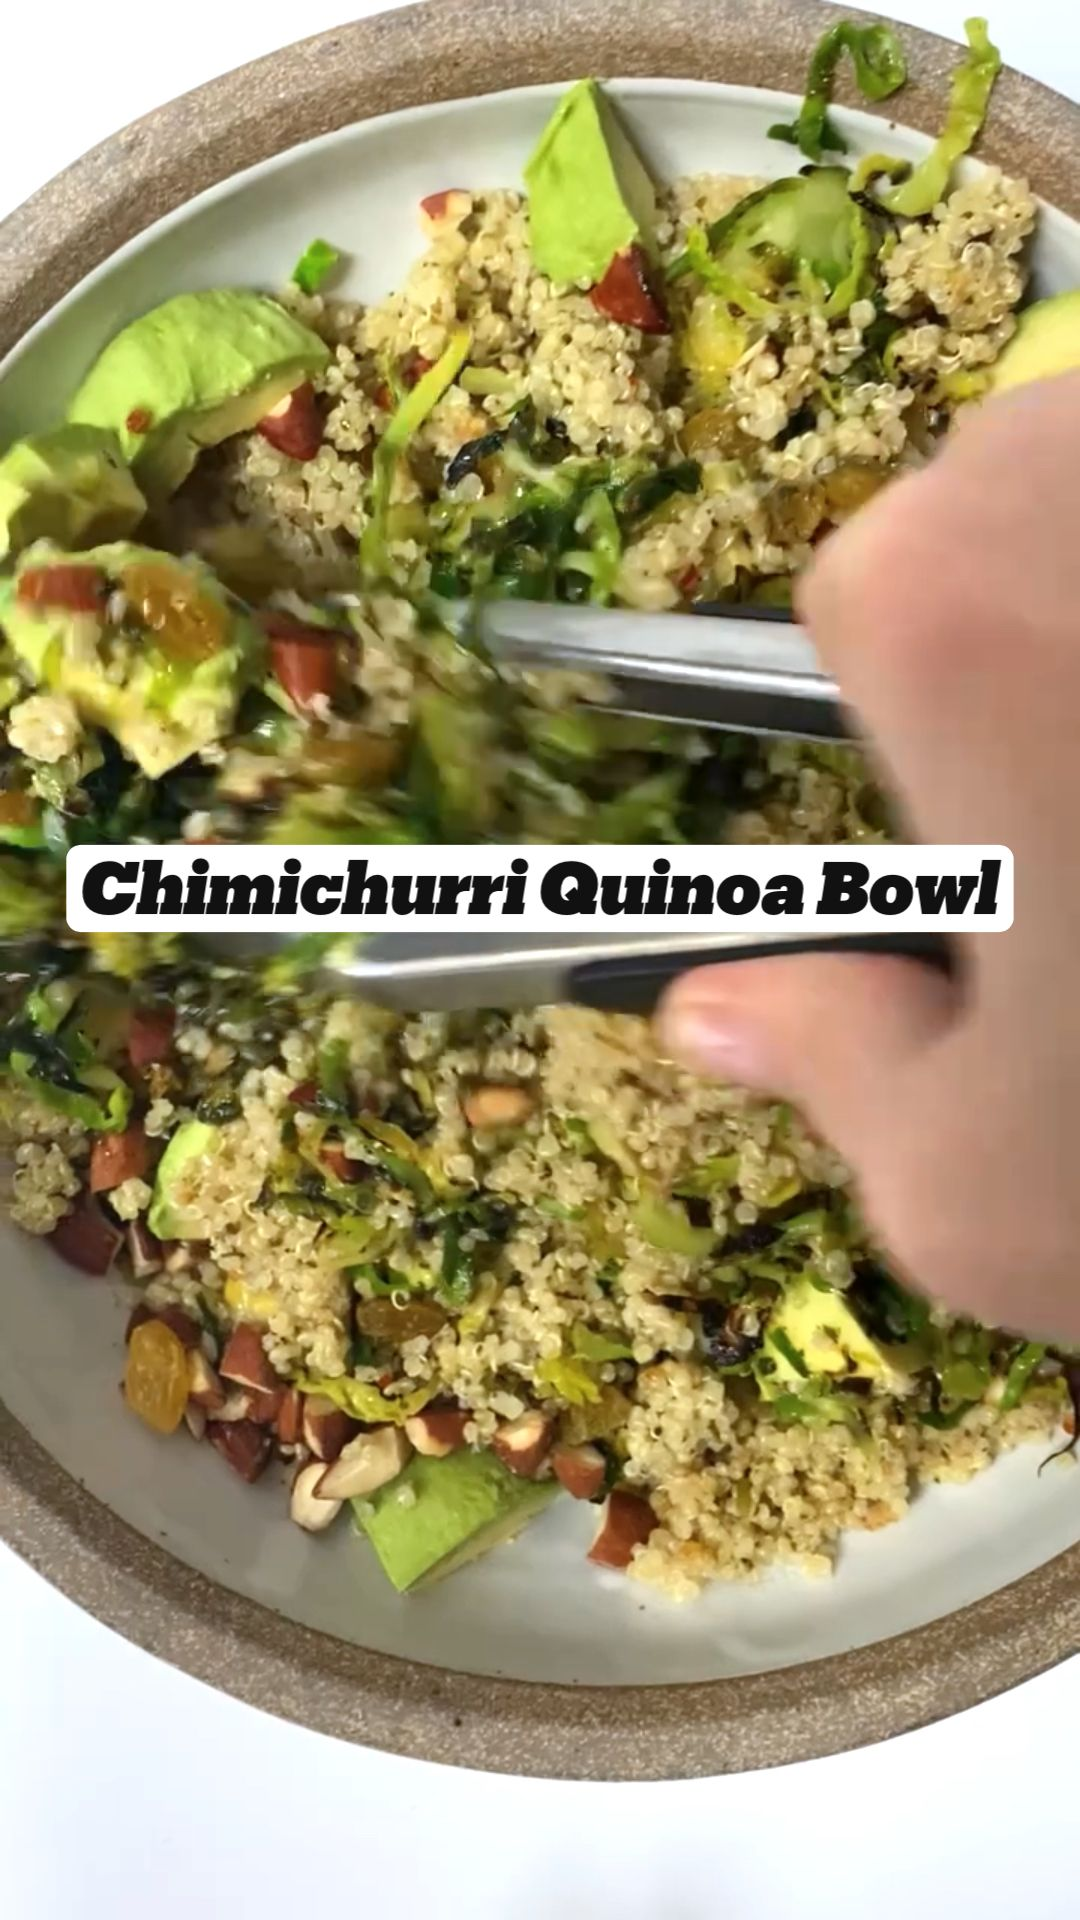 Chimichurri Quinoa Bowl